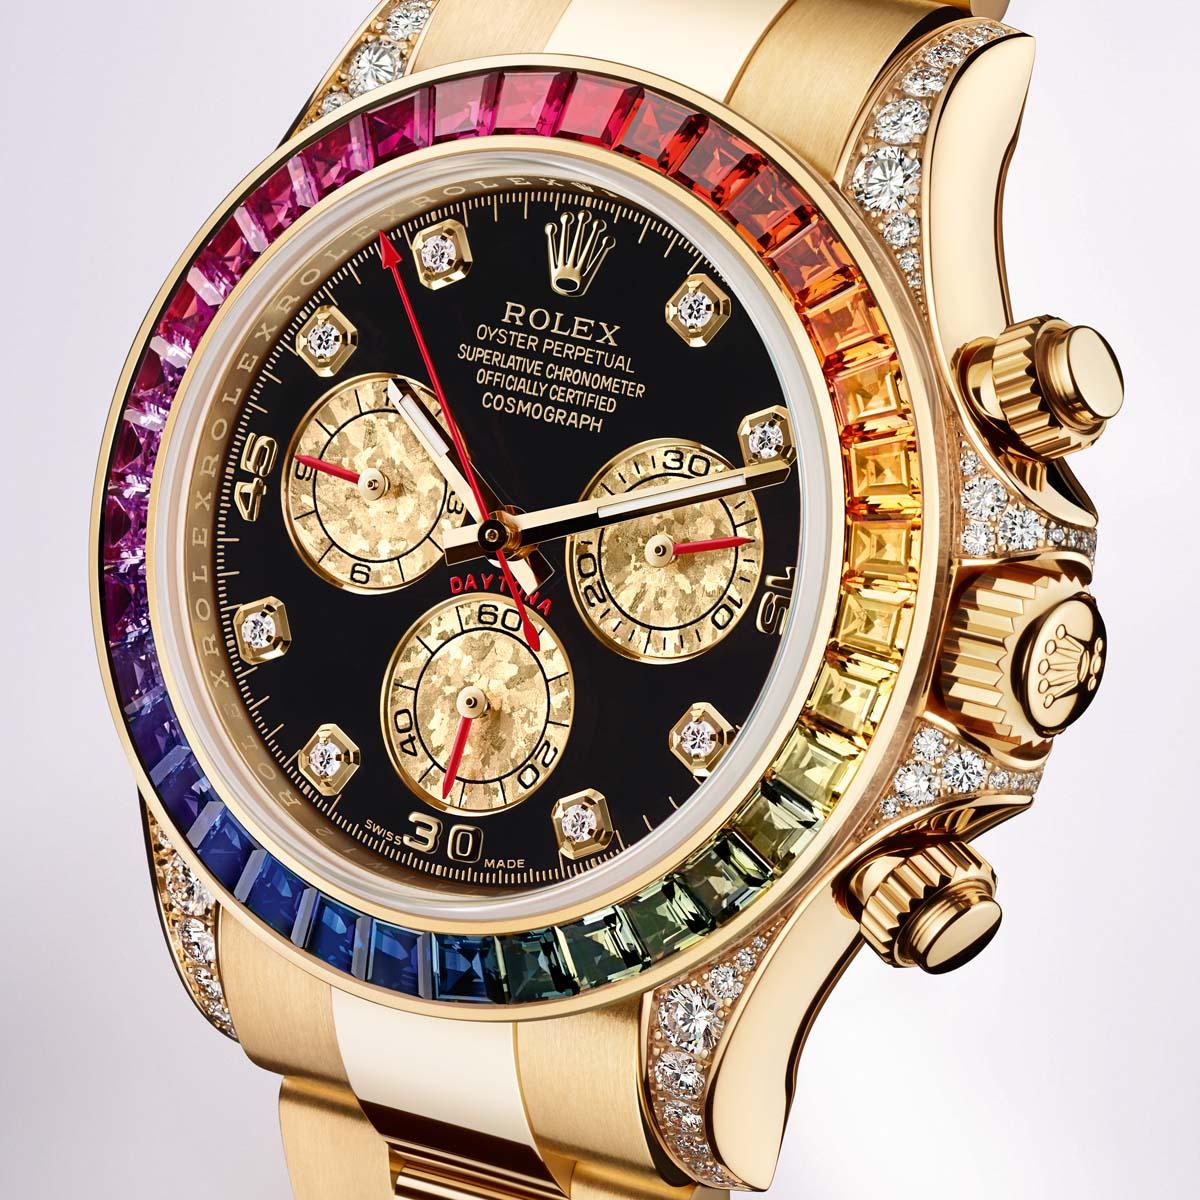 La Cote des Montres : Photo - Rolex Oyster Perpetual Cosmograph Daytona